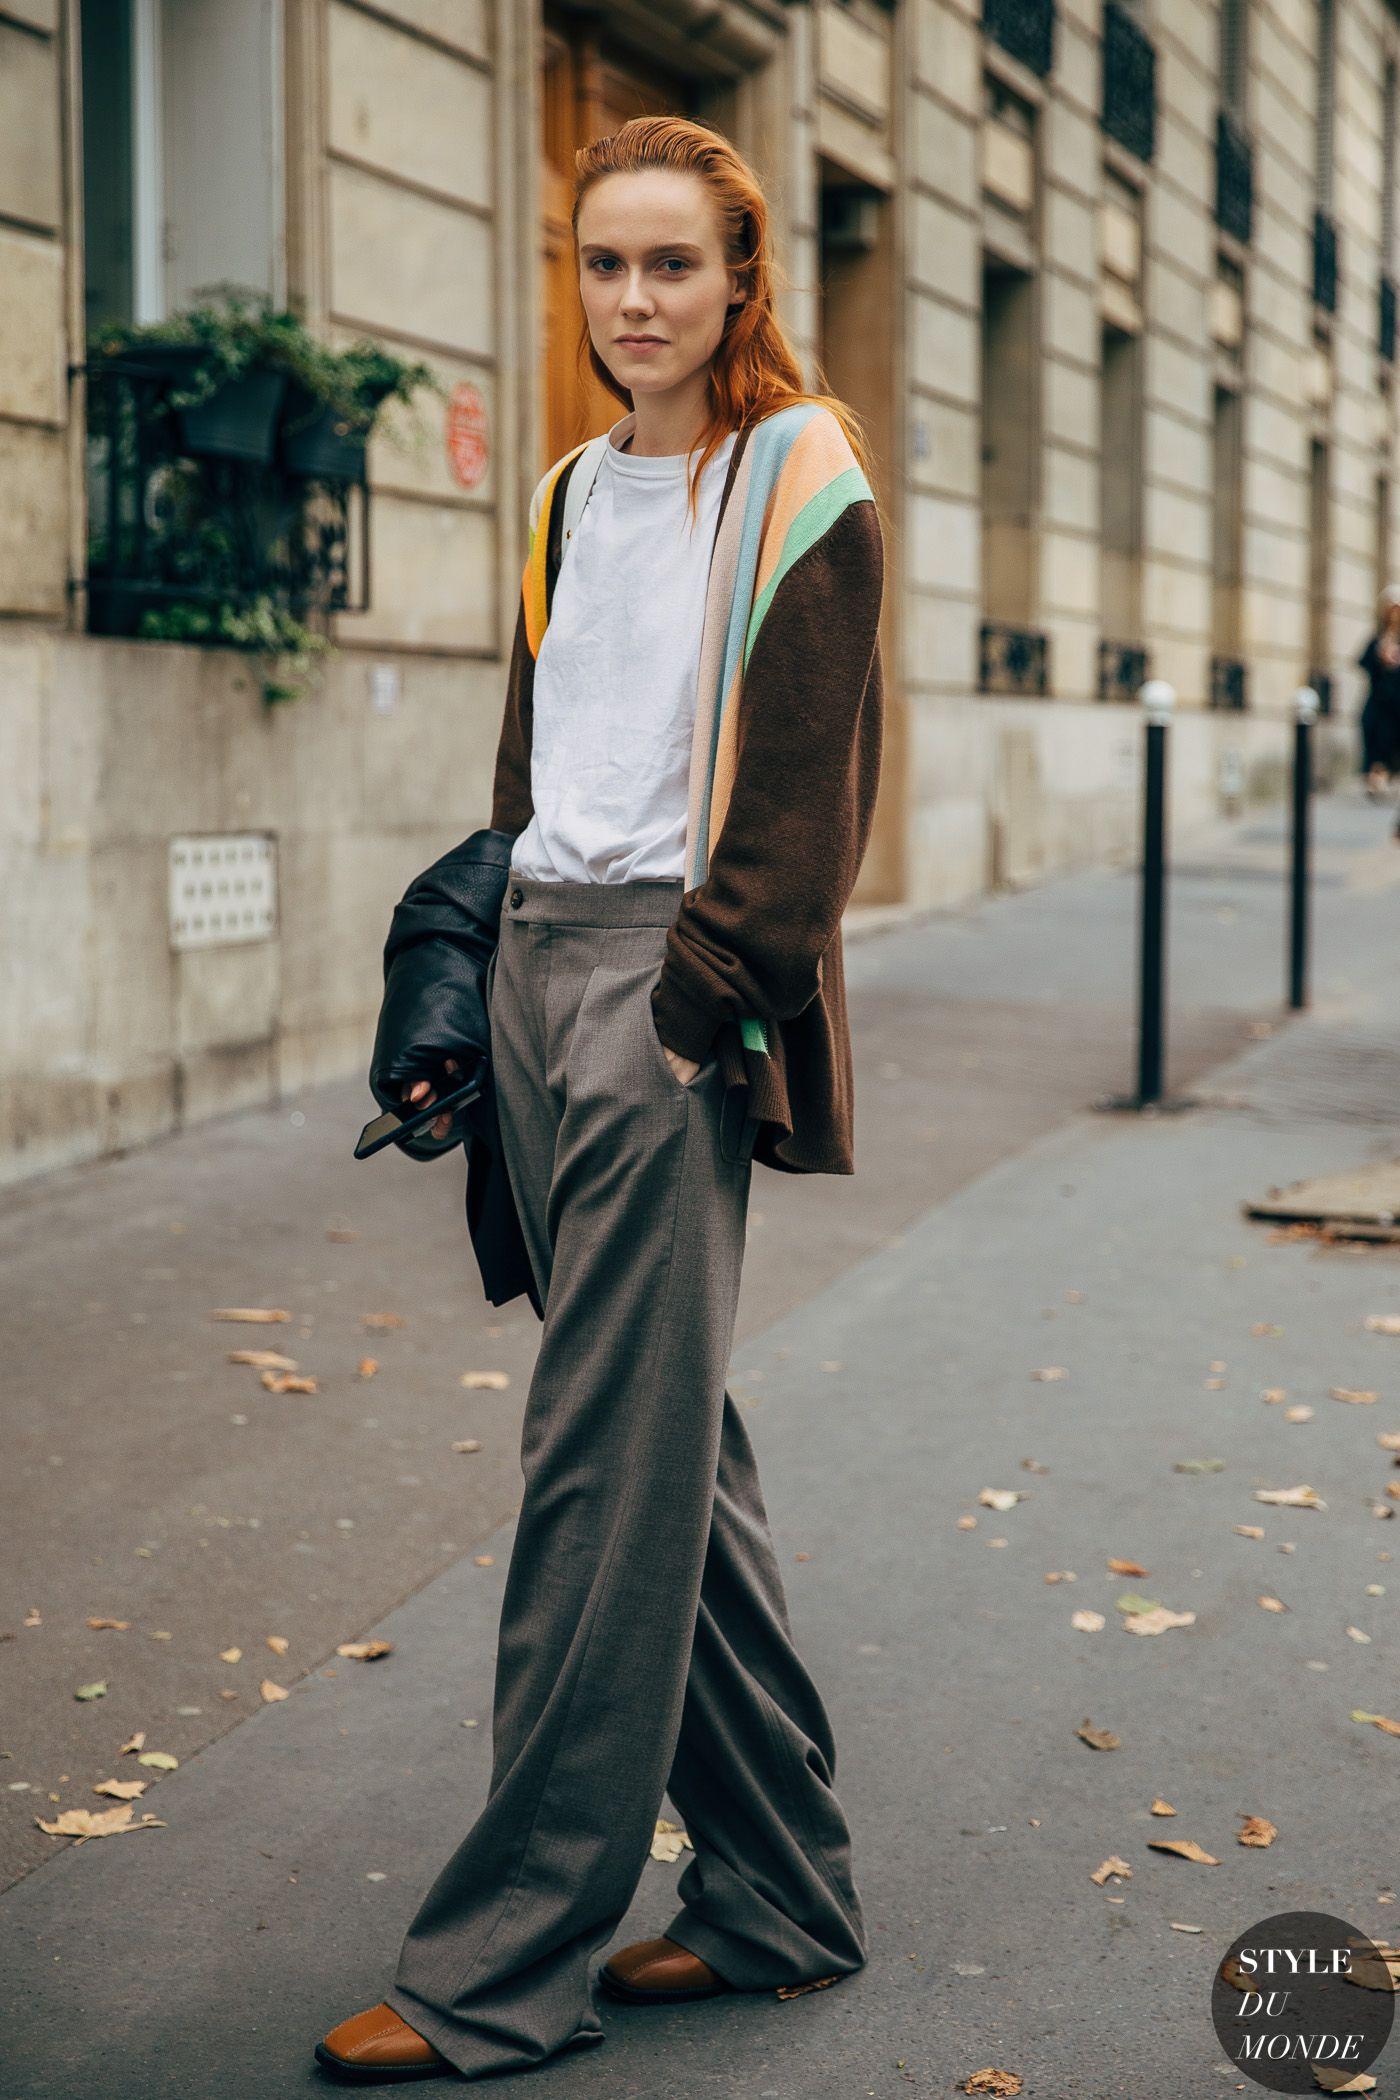 Paris SS 2020 Street Style: Kiki Willems - STYLE DU MONDE   Street Style Street Fashion Photos Kiki Willems